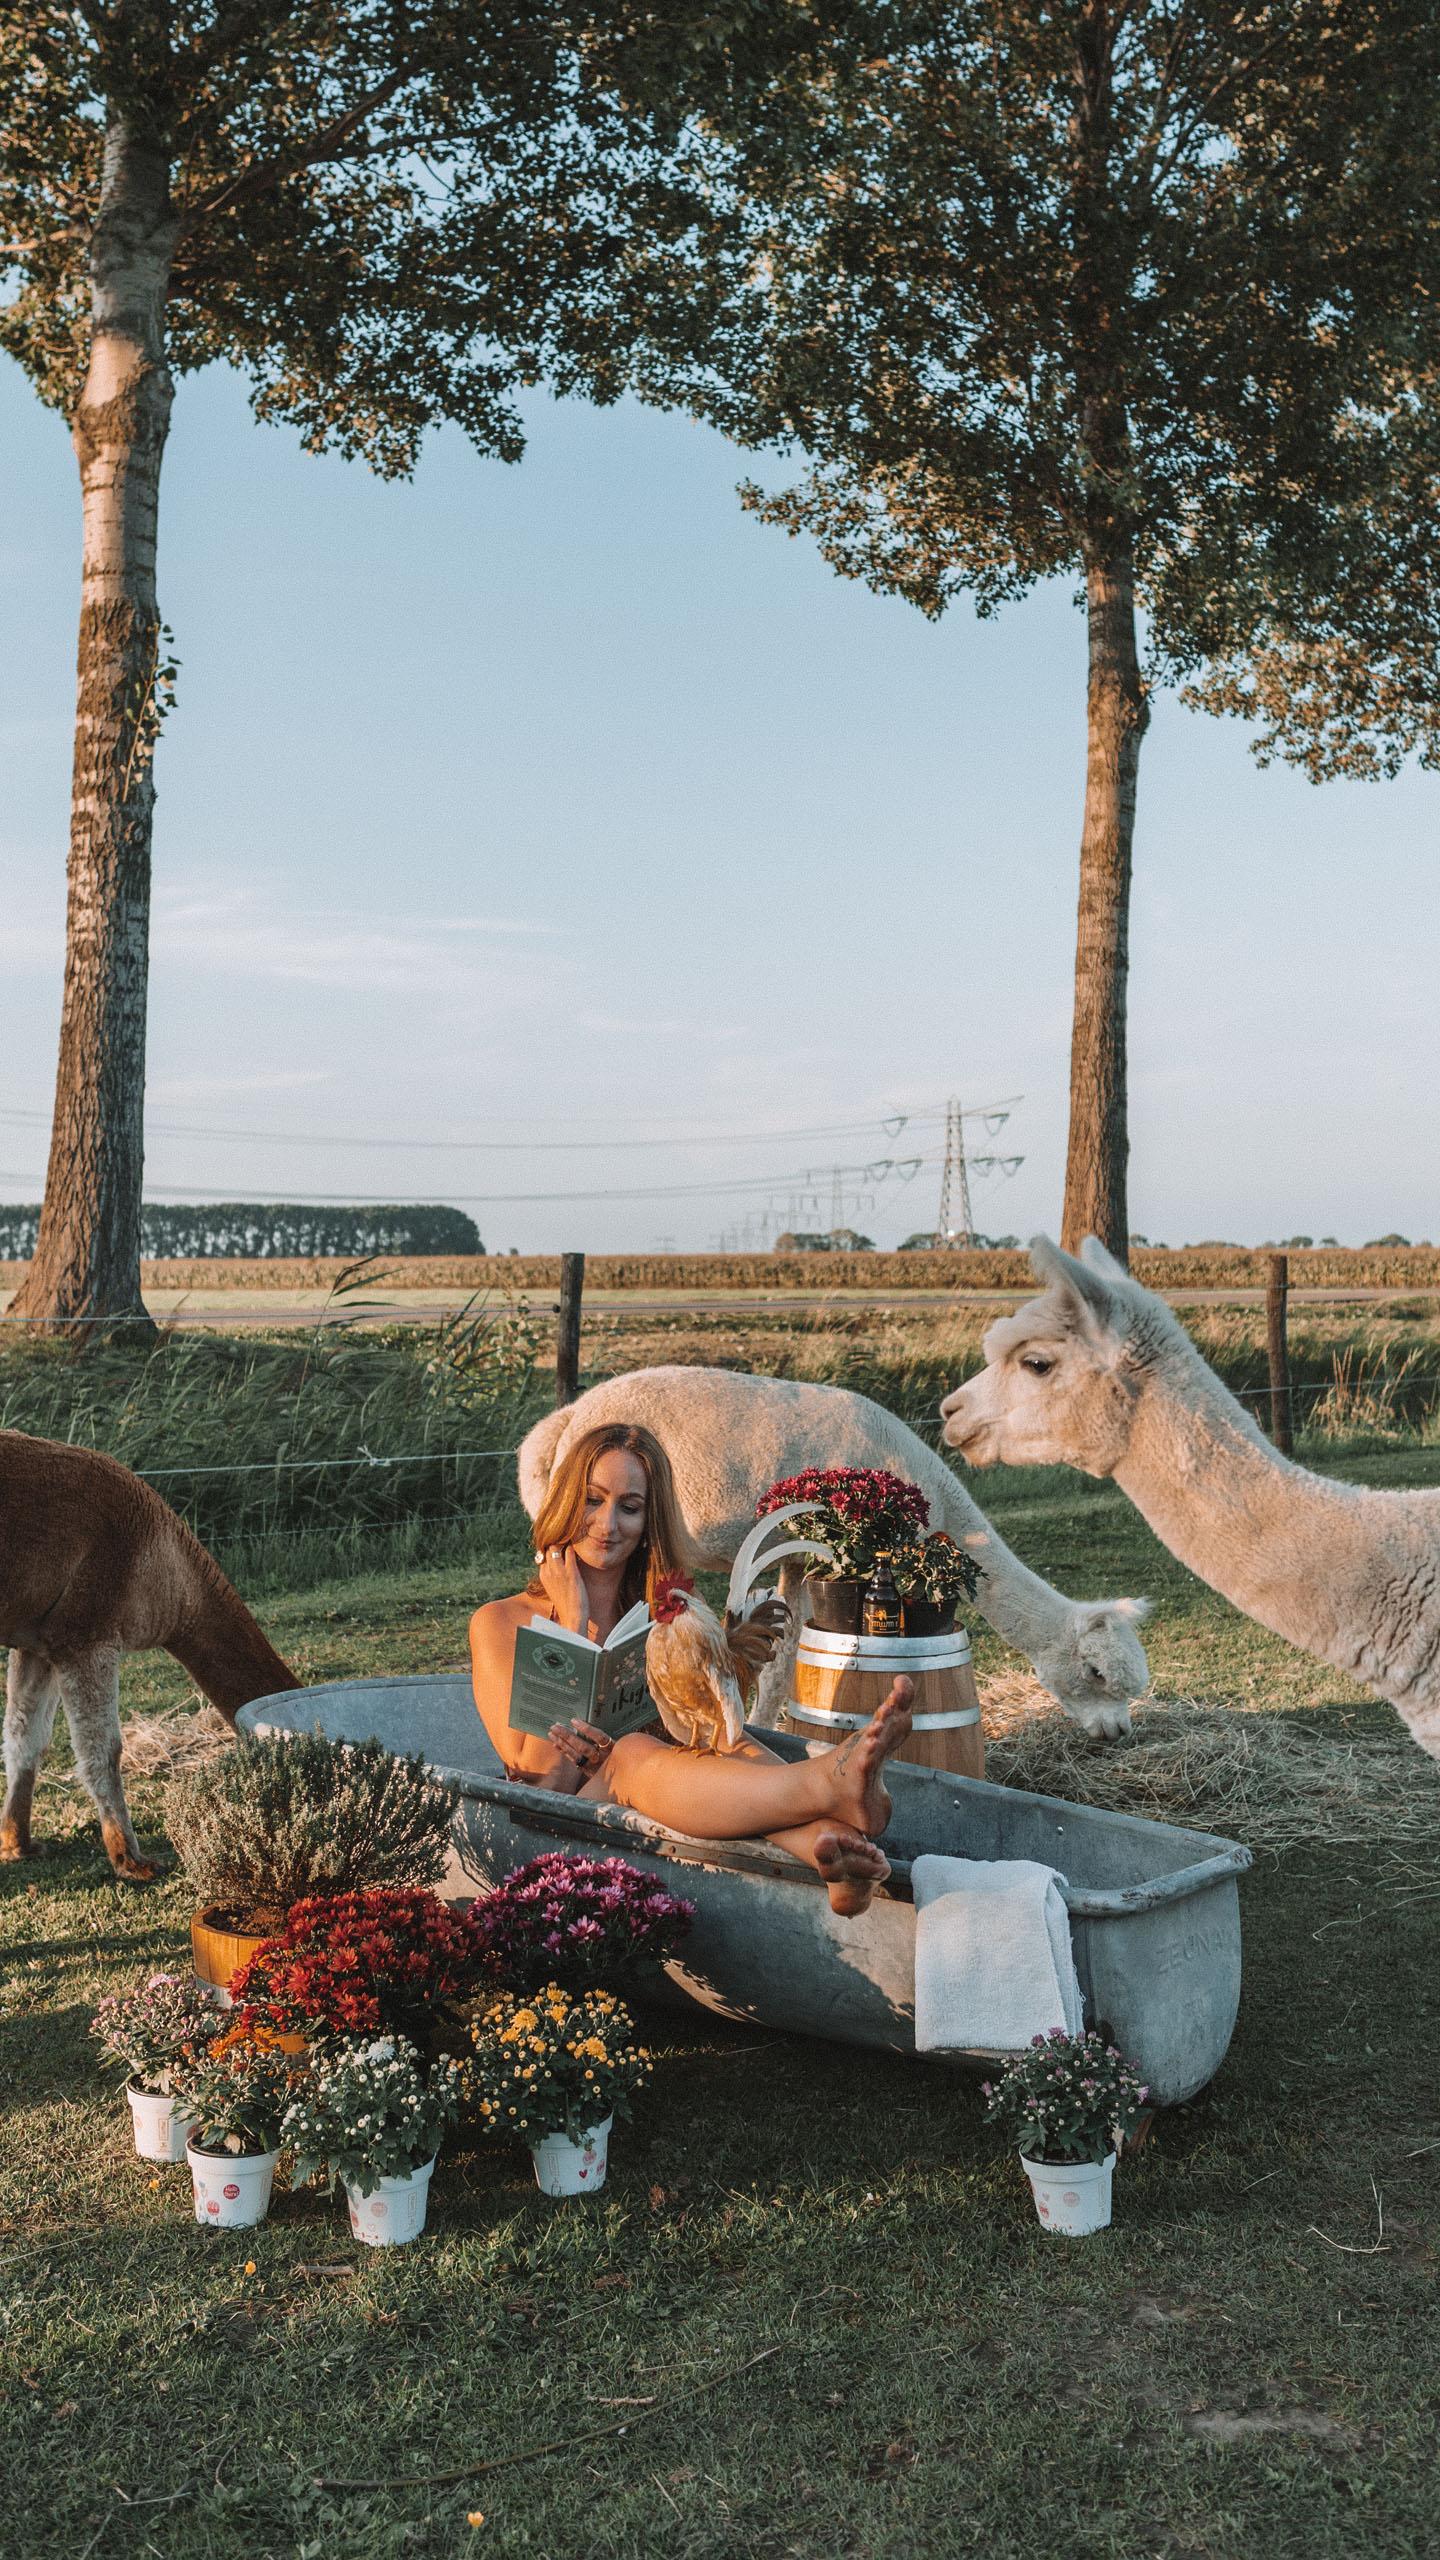 Belgian mums Alpaca's Linda's Wholesome Life